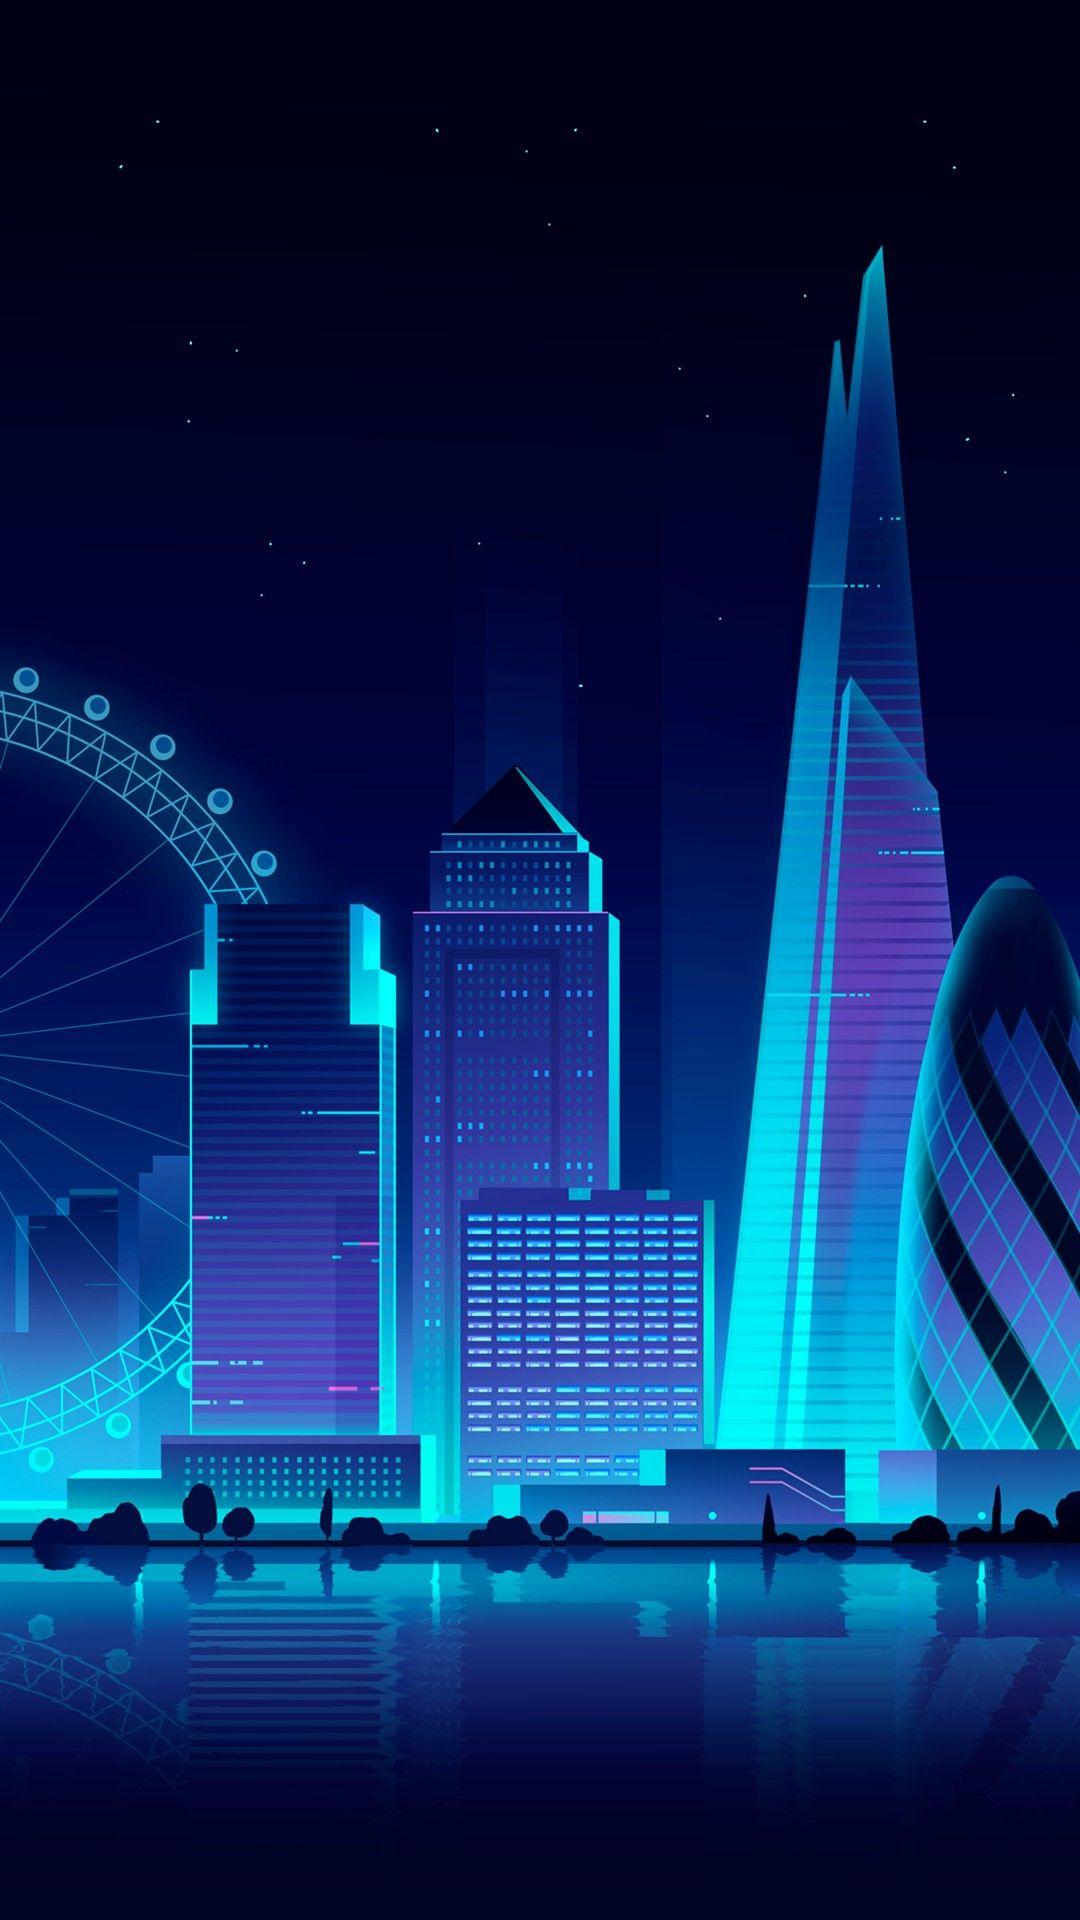 Blue City Night Spectacular Https Imaginationrevelation Com